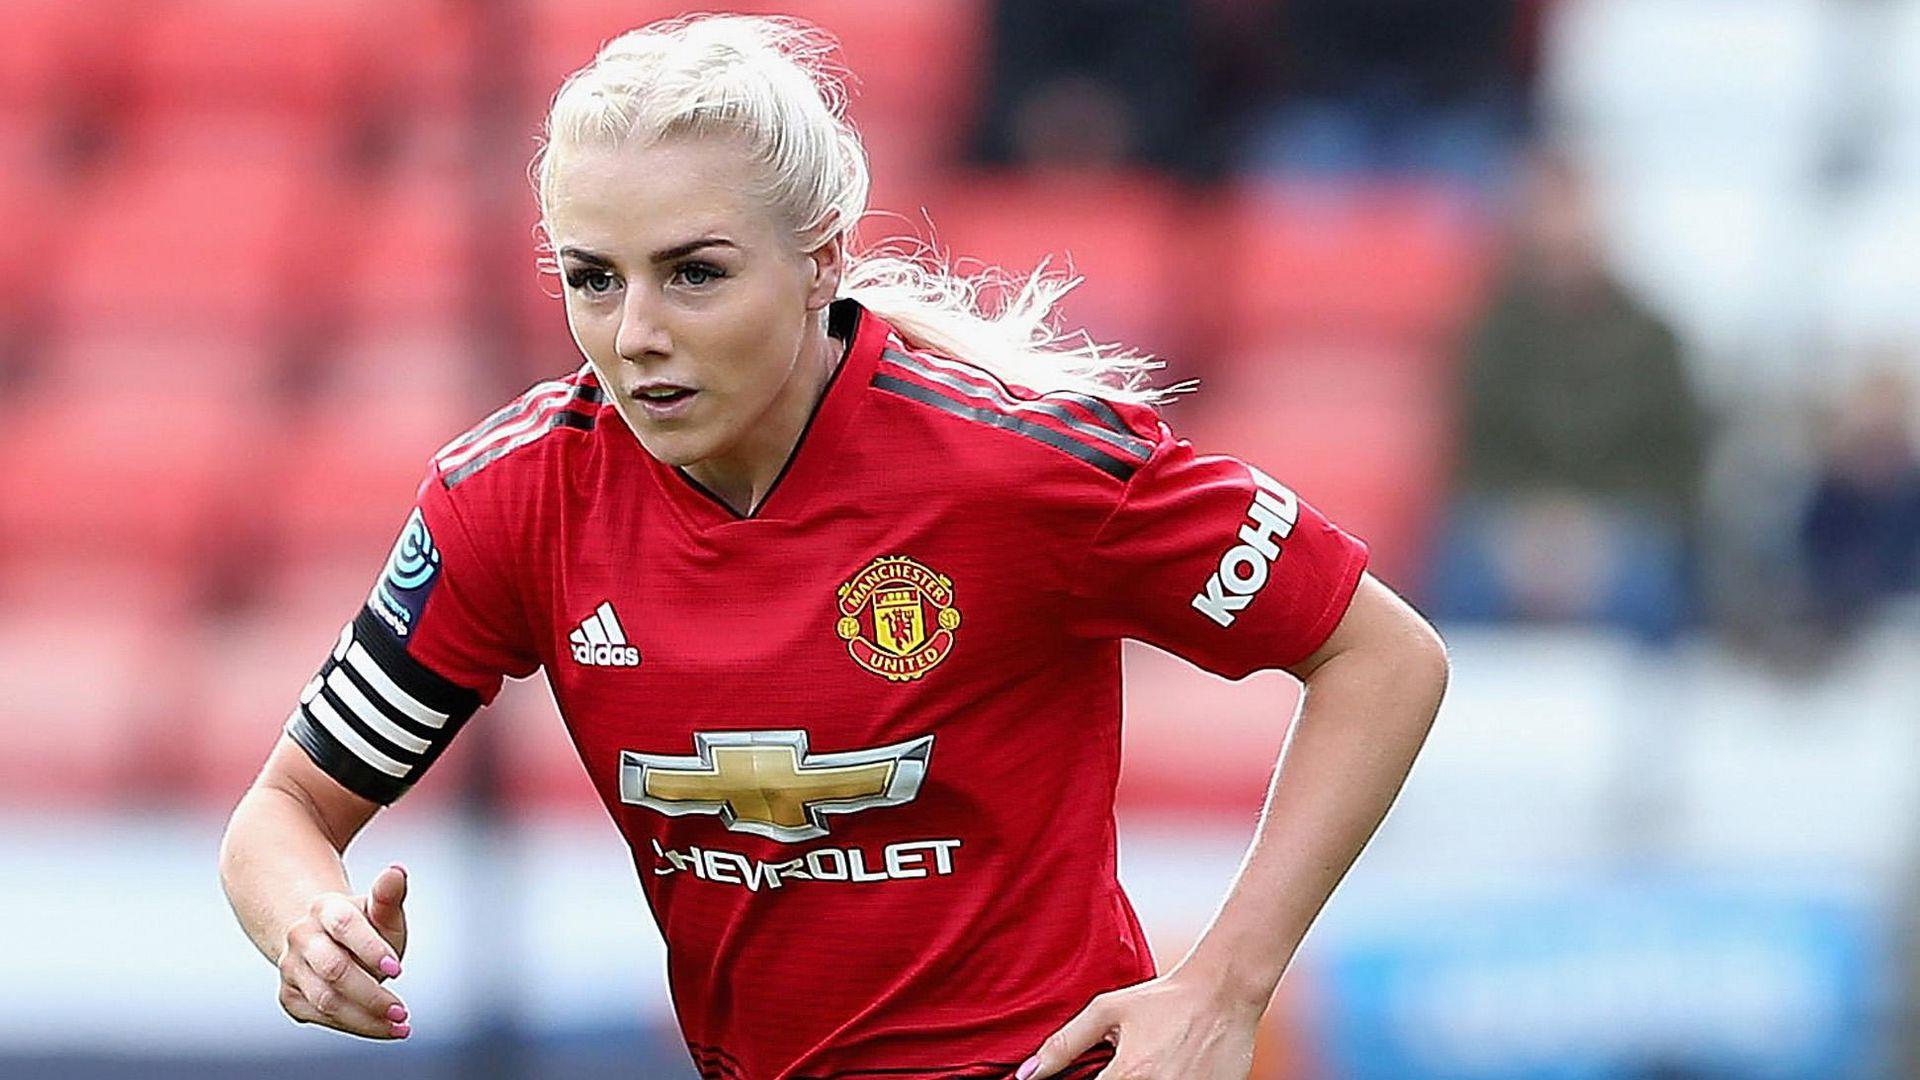 Srikandi Manchester United Pada Piala Dunia Perempuan 2019